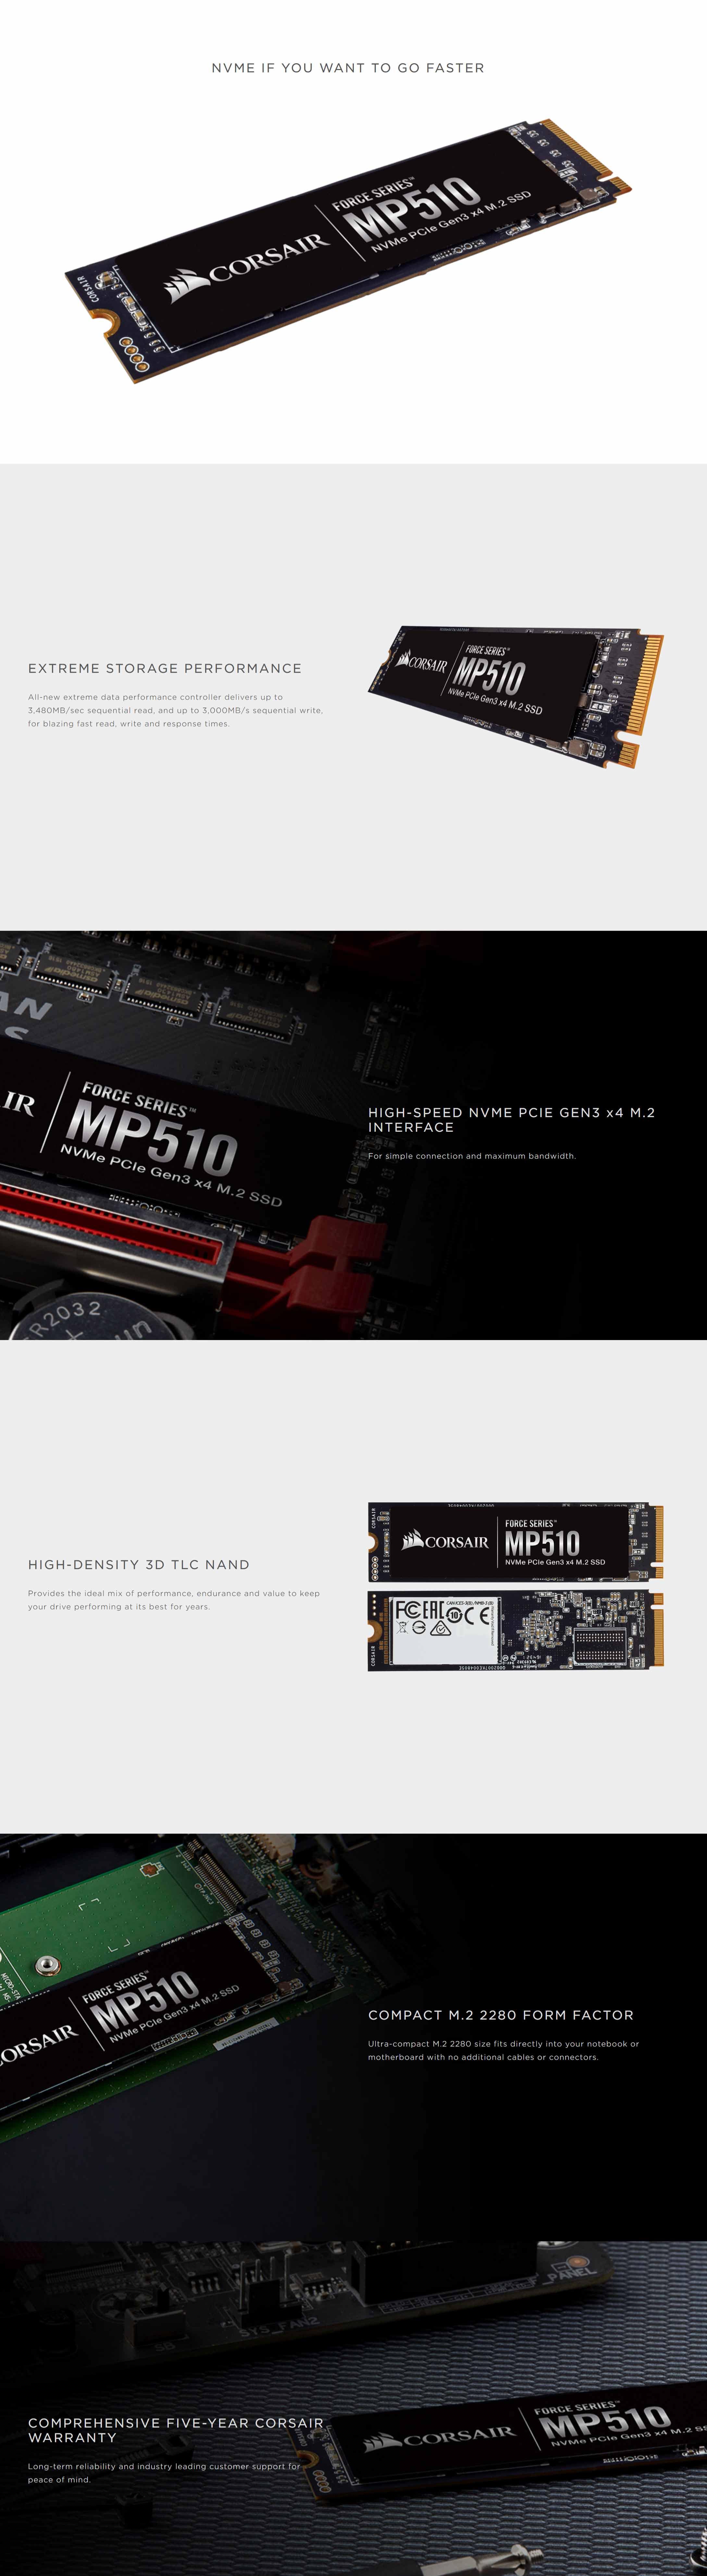 screencapture-corsair-us-en-Categories-Products-Storage-M-2-SSDs-Force-Series-MP510-p-CSSD-F480GBMP510-2020-04-27-18_24_33.jpg